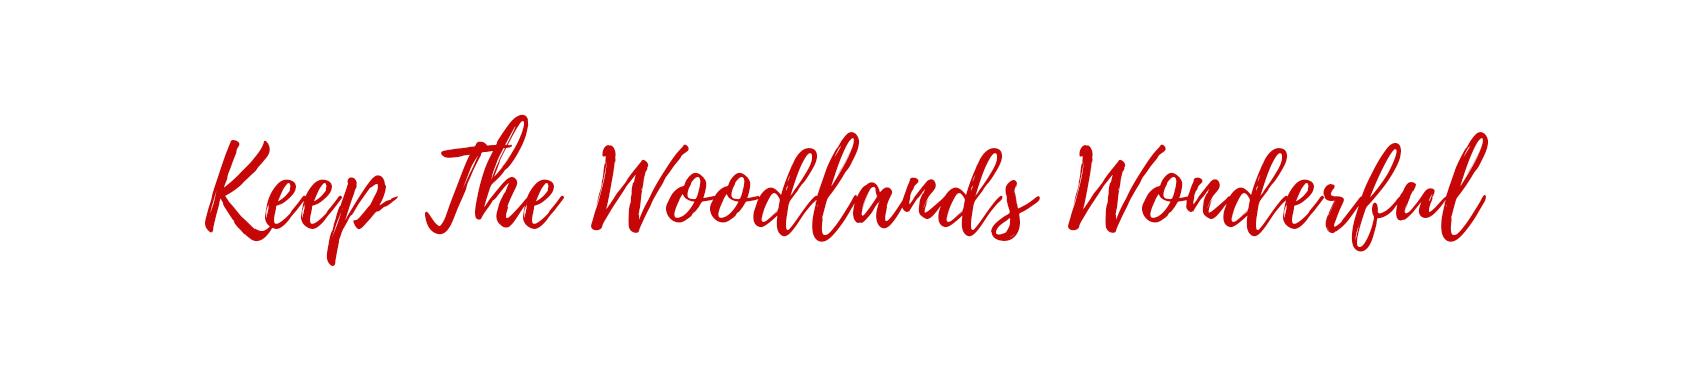 Keep The Woodlands Wonderful logo